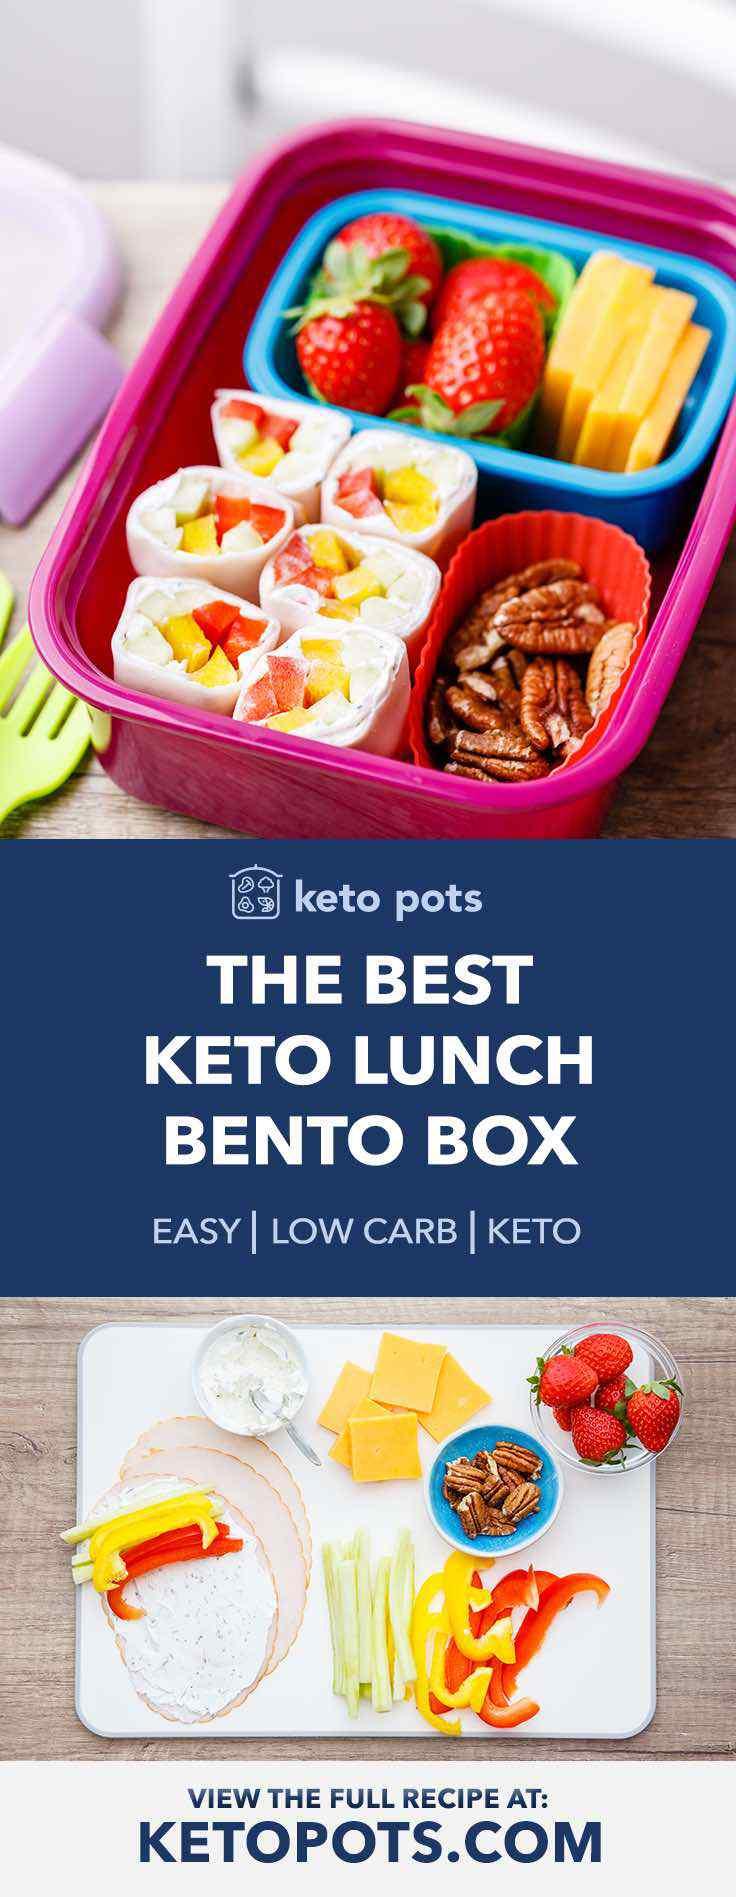 Keto Lunch Bento Box for Kids